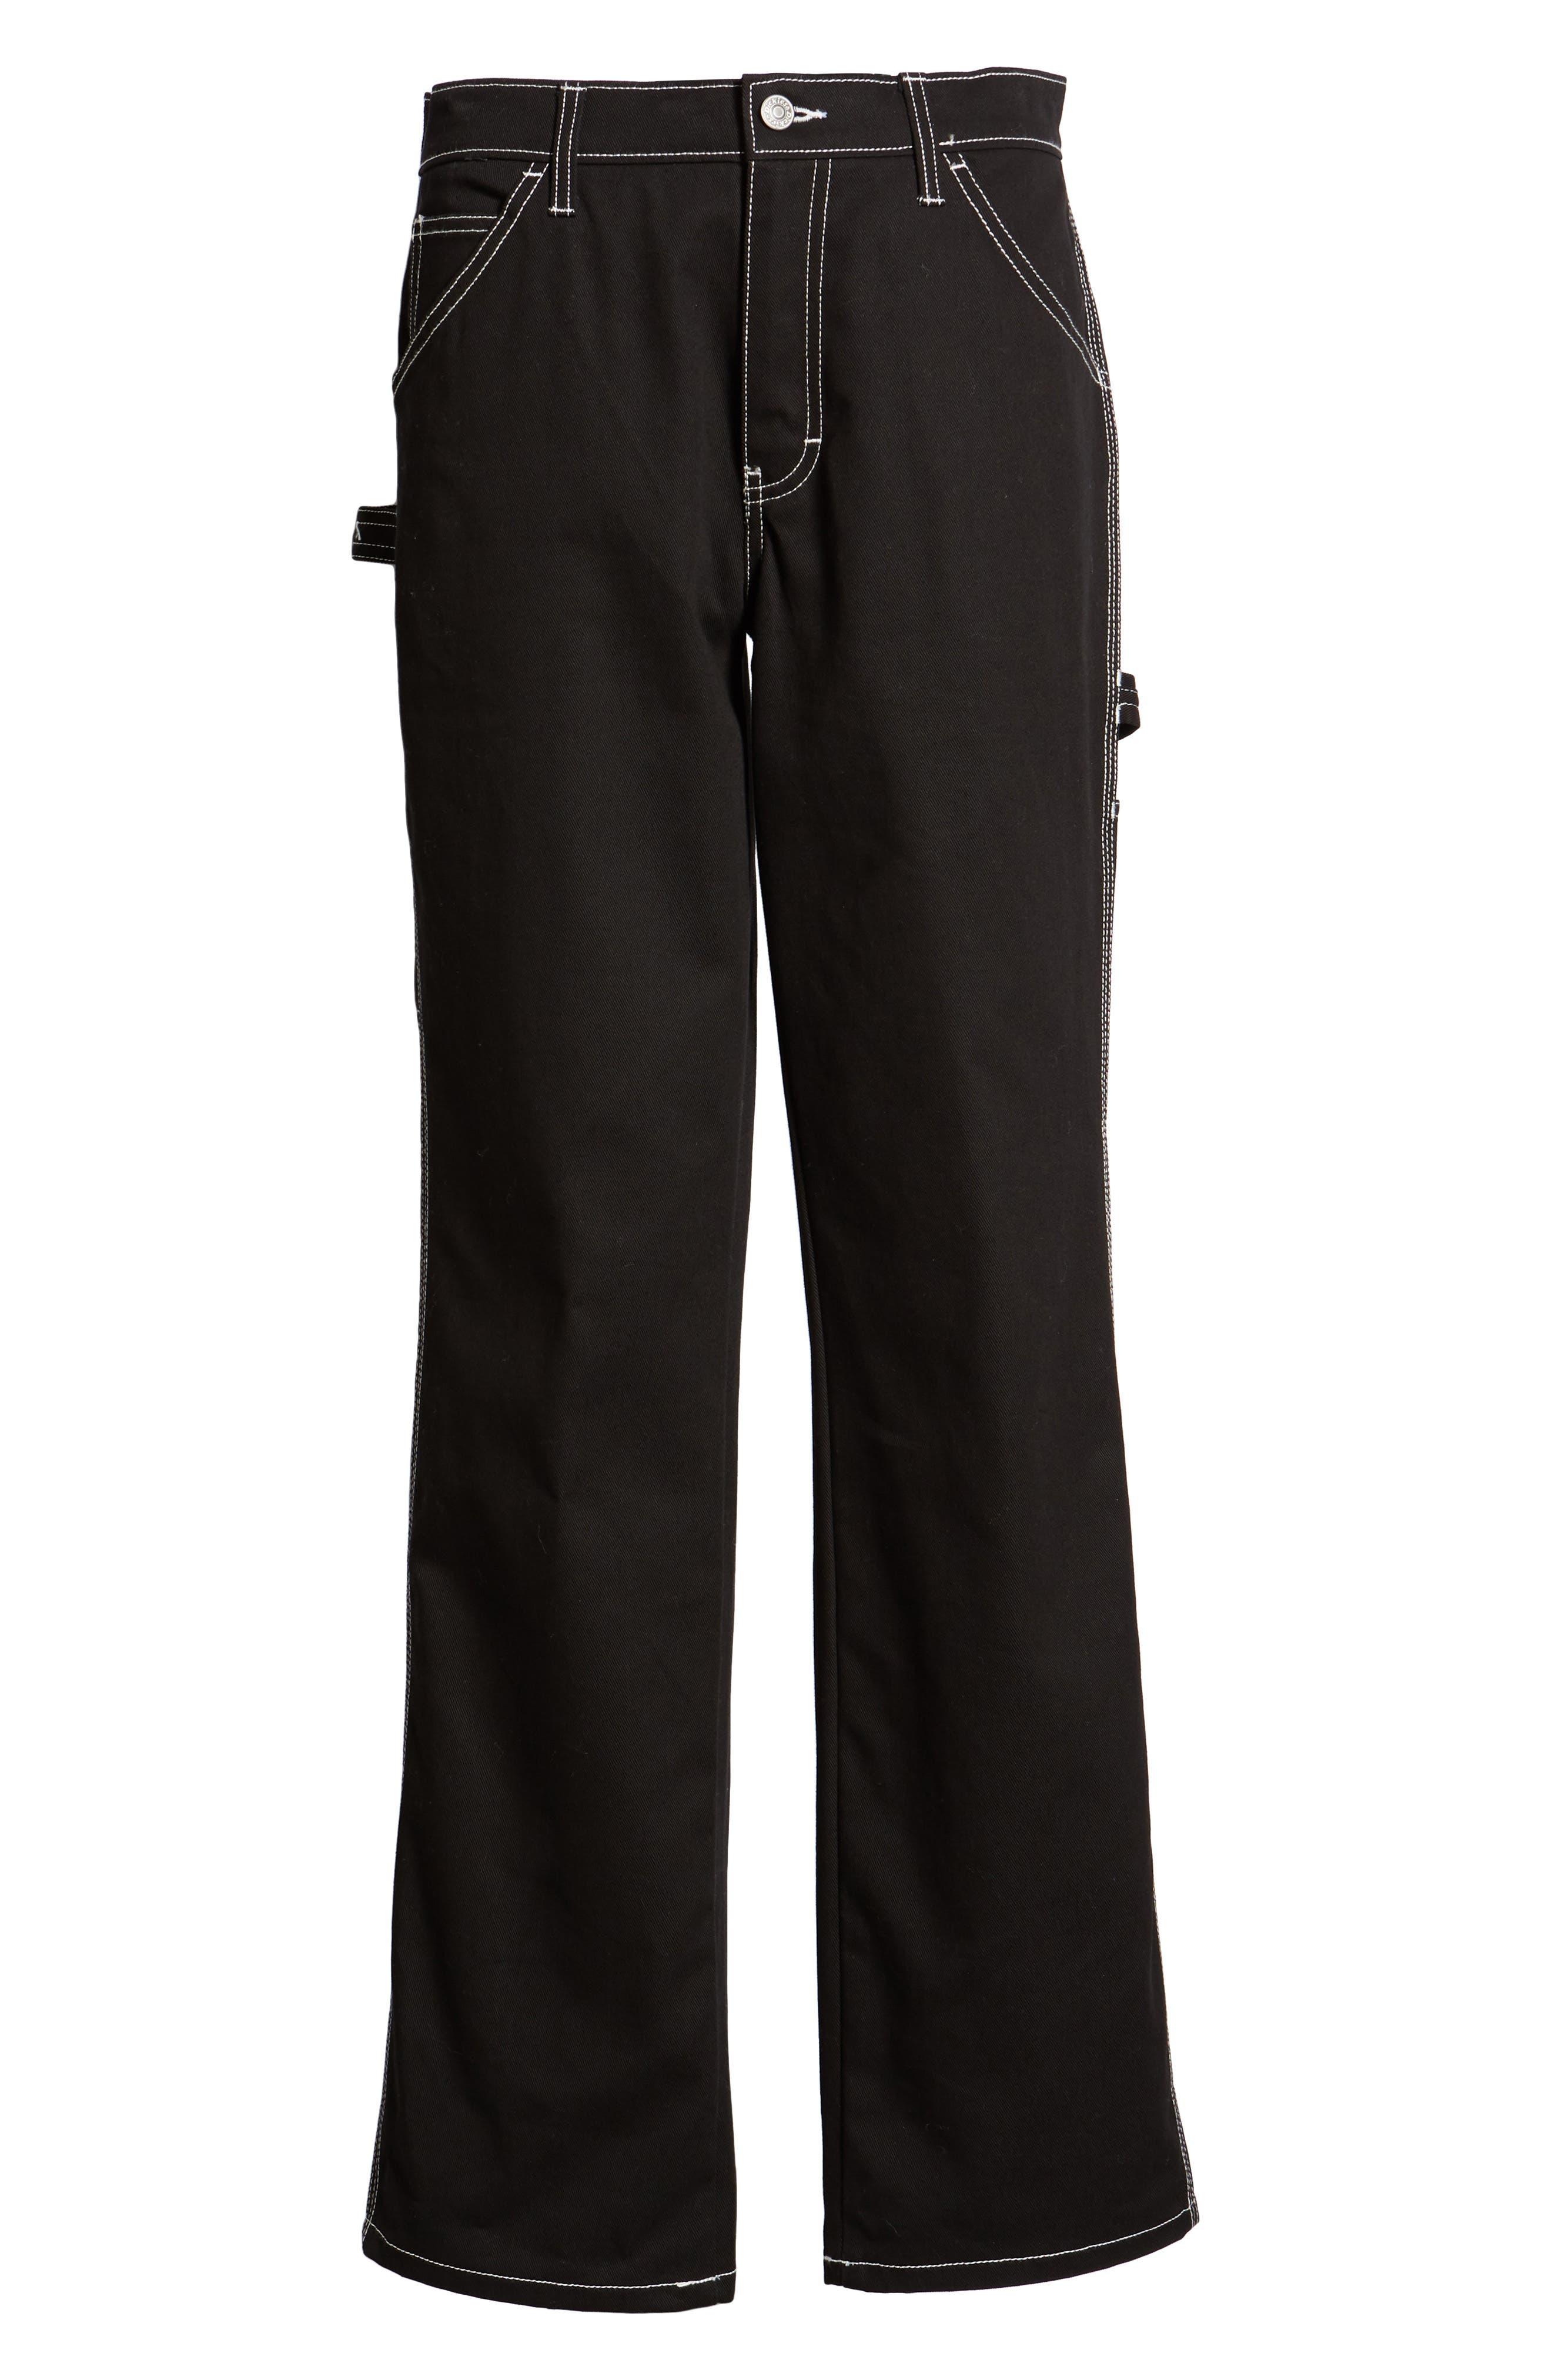 DICKIES, Relaxed Fit Carpenter Pants, Alternate thumbnail 7, color, BLACK